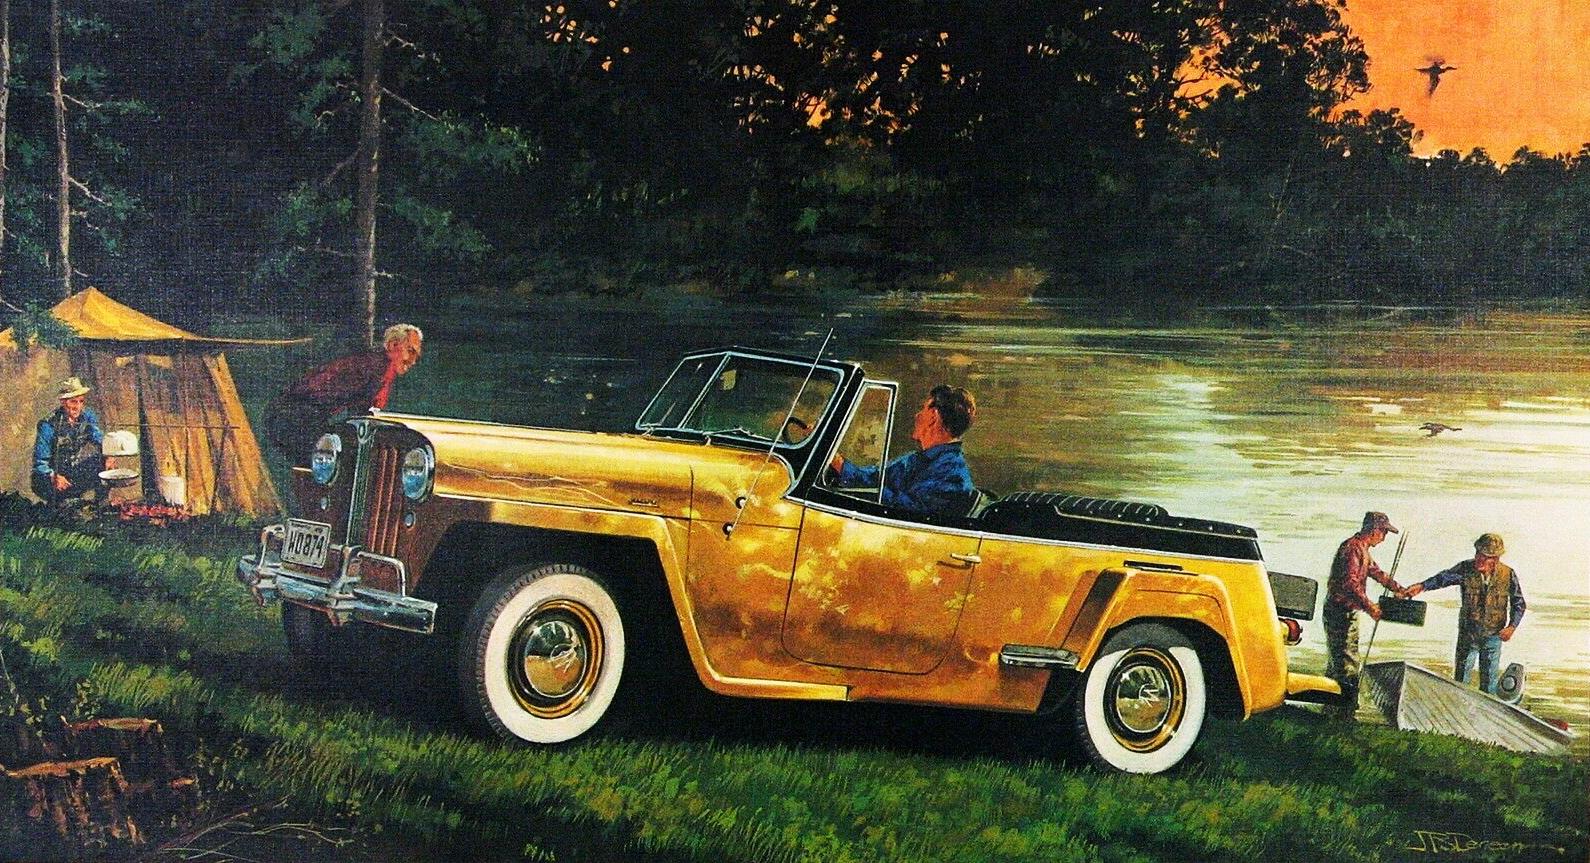 1948. Willys Overland Jeepster. Иллюстрация Джеймса Б. Денина